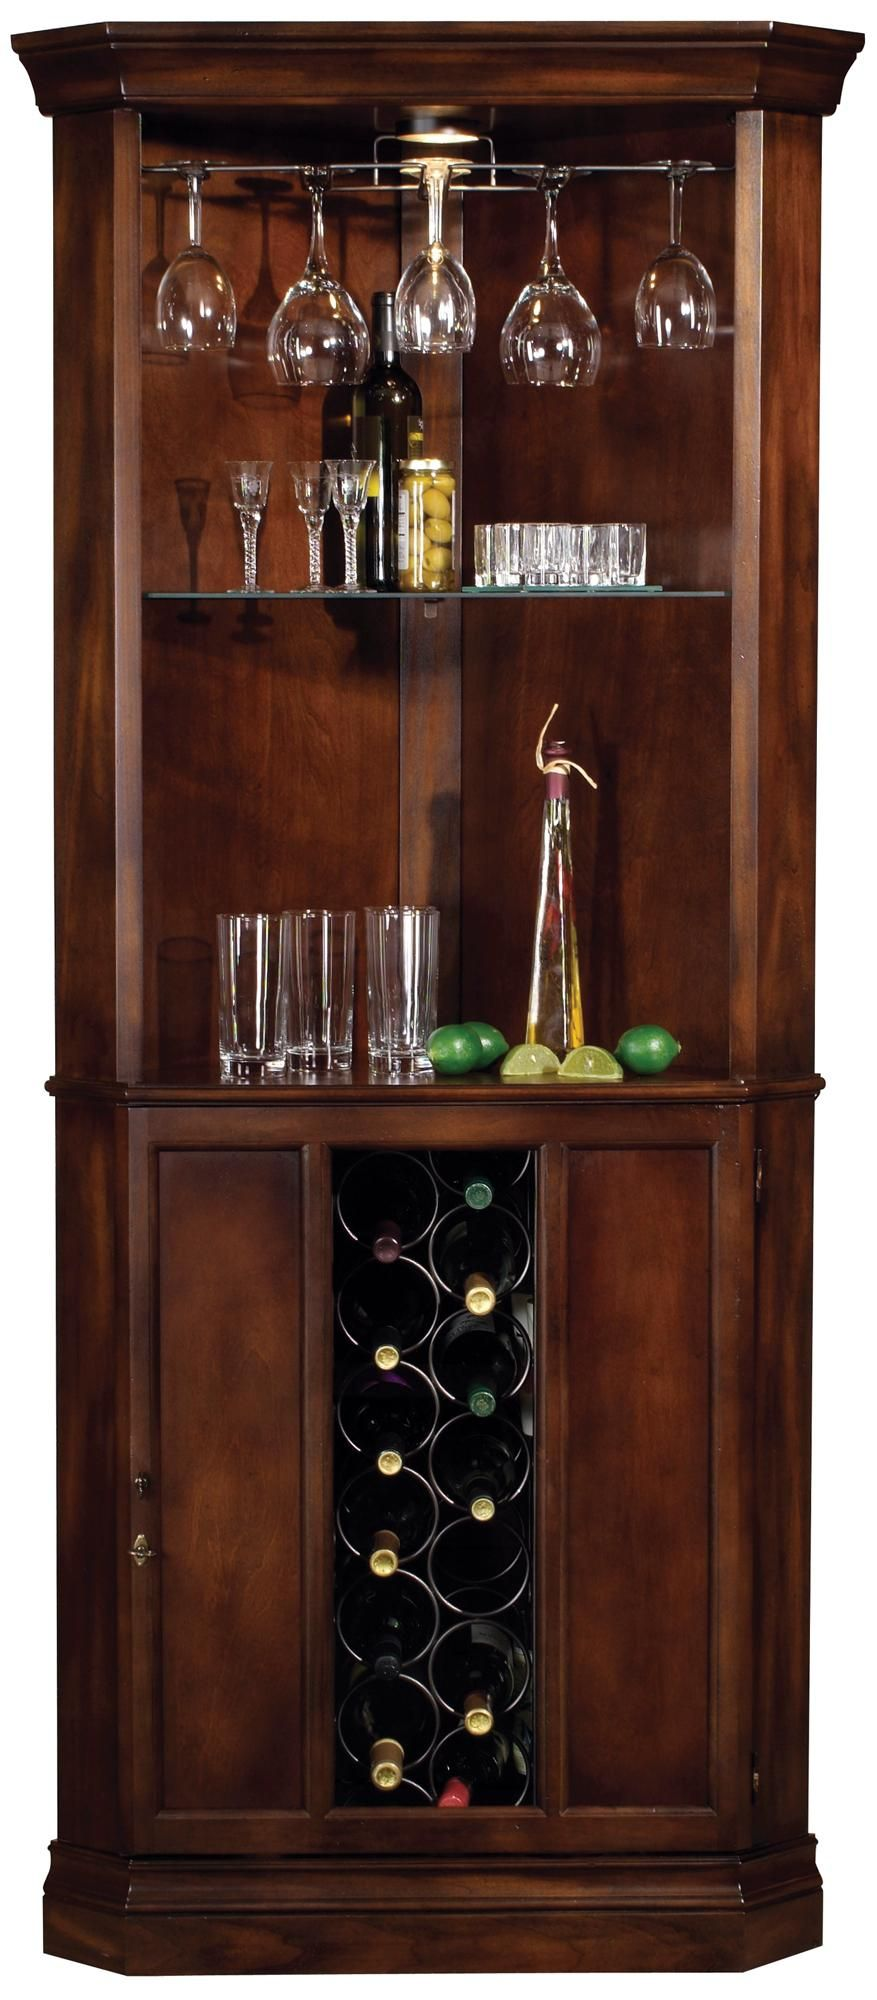 Howard Miller Piedmont Rustic Cherry Corner Bar Cabinet Style R7963 Corner Bar Cabinet